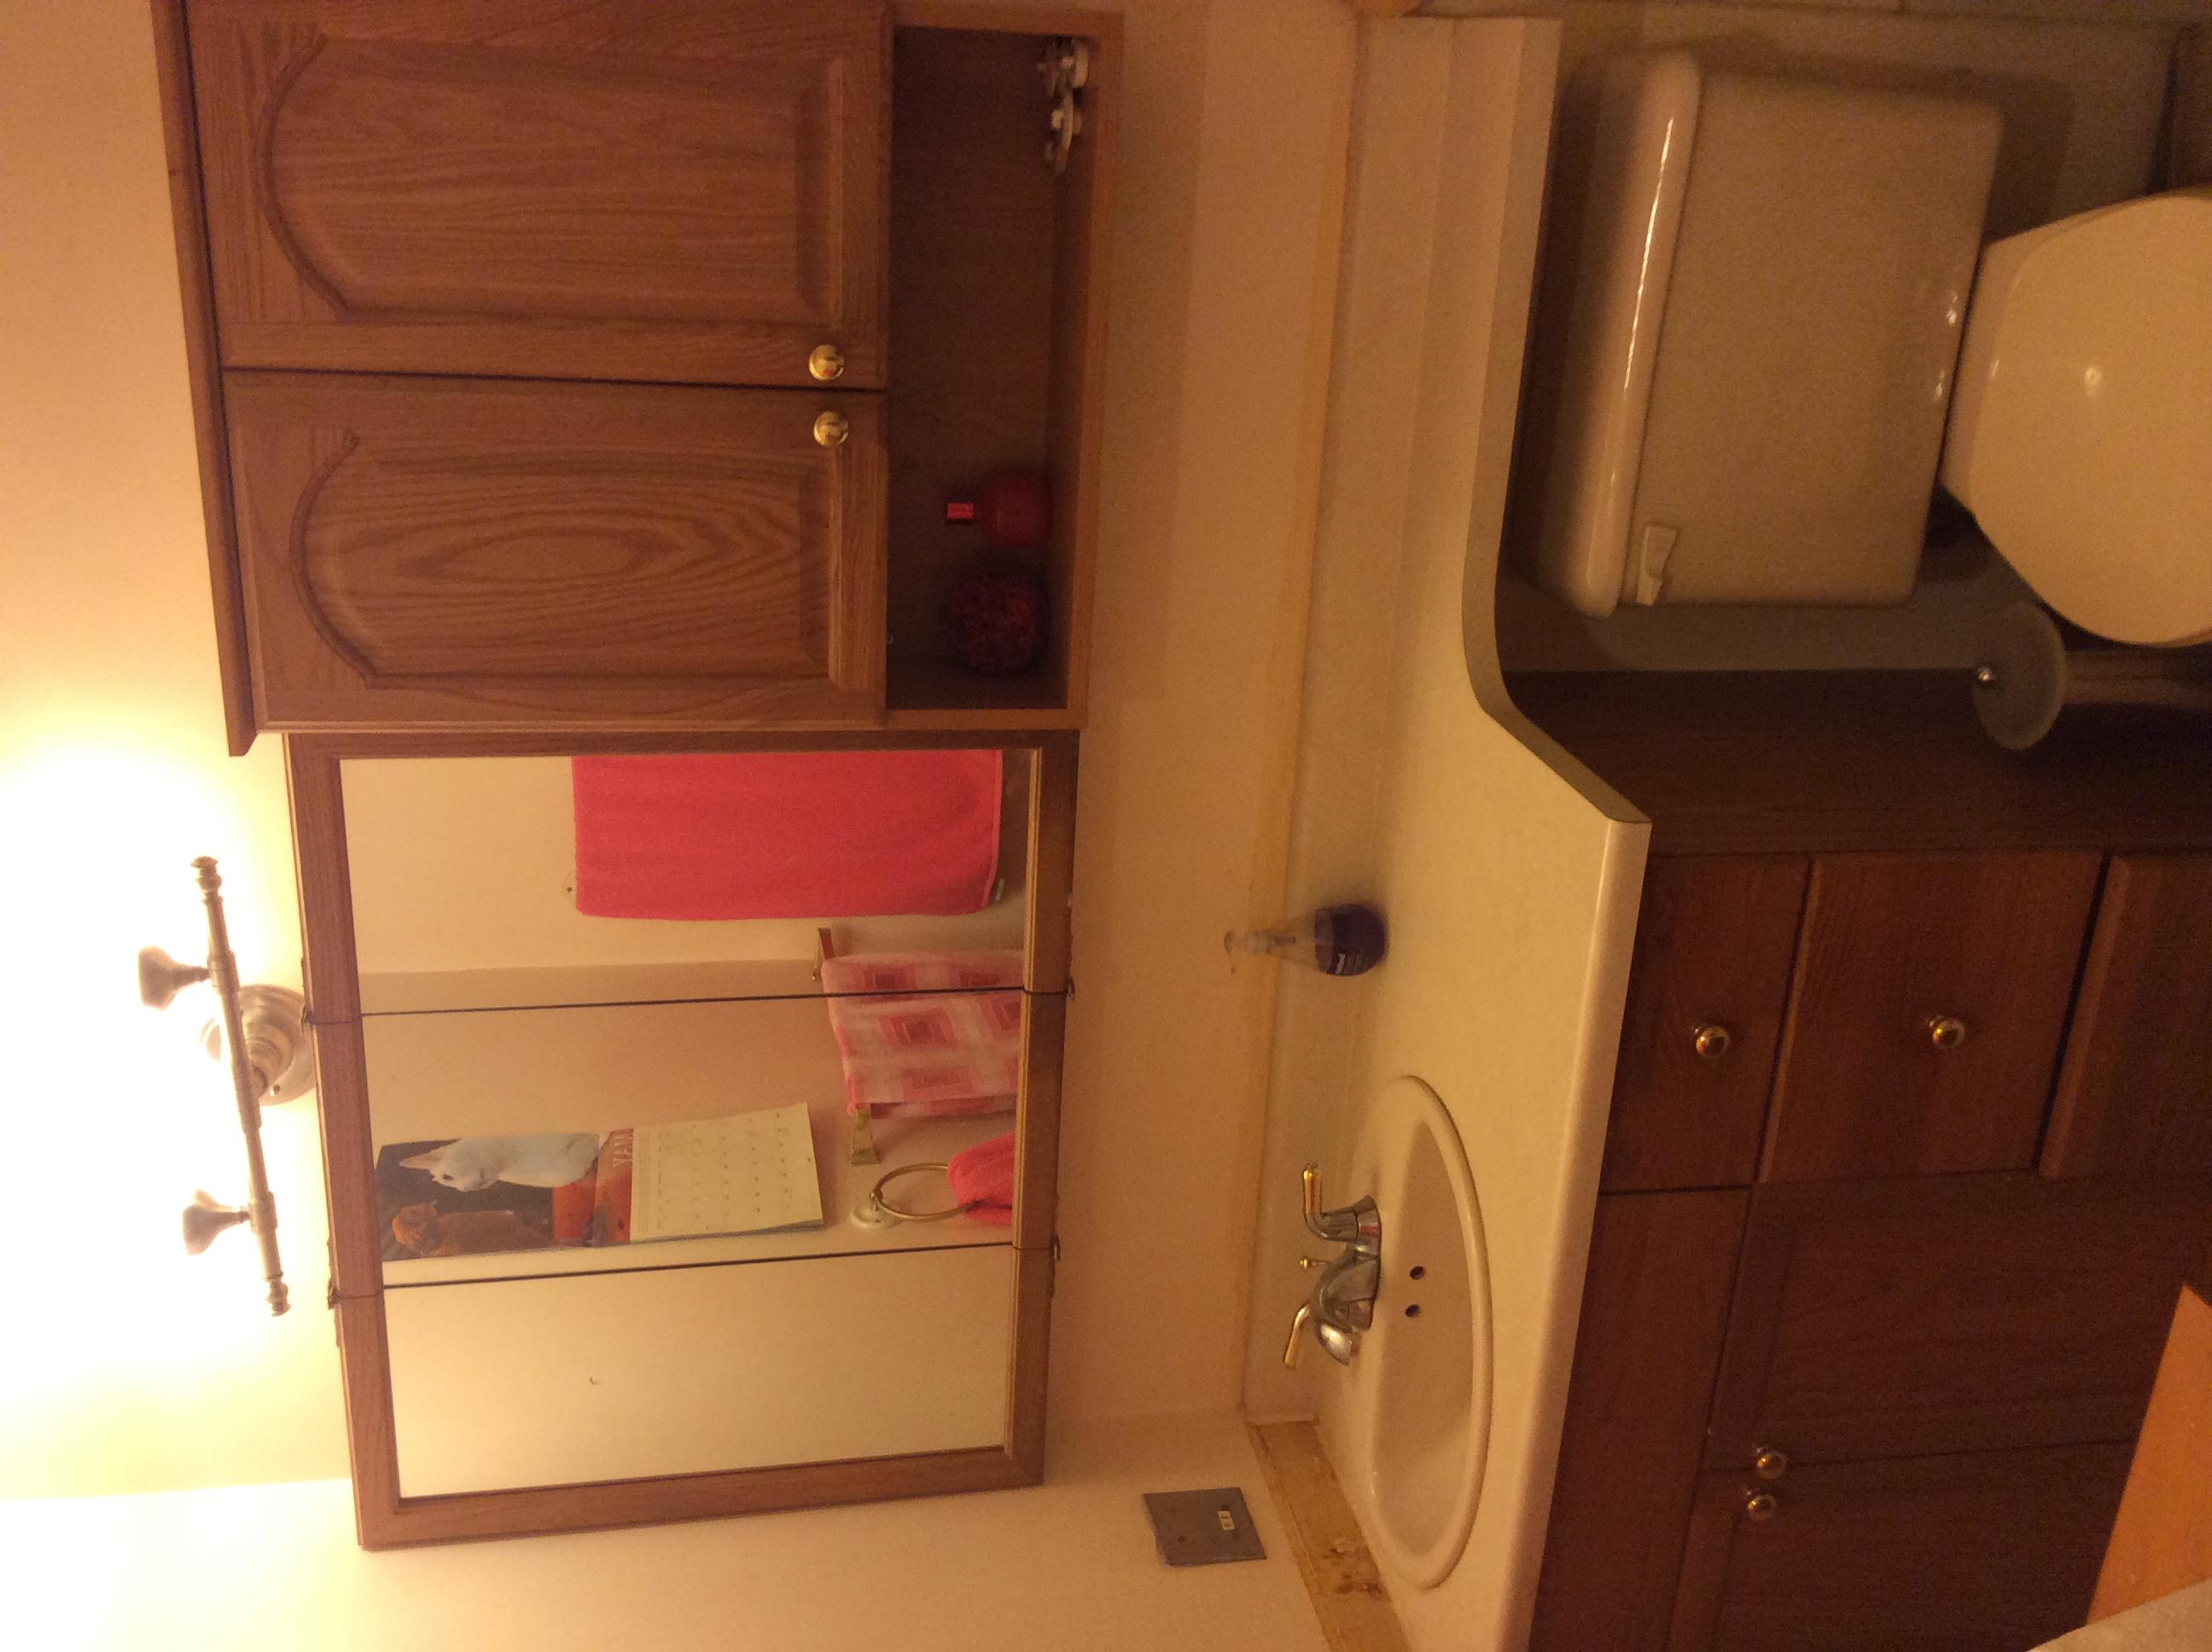 Inglewood Condo Bathroom Before